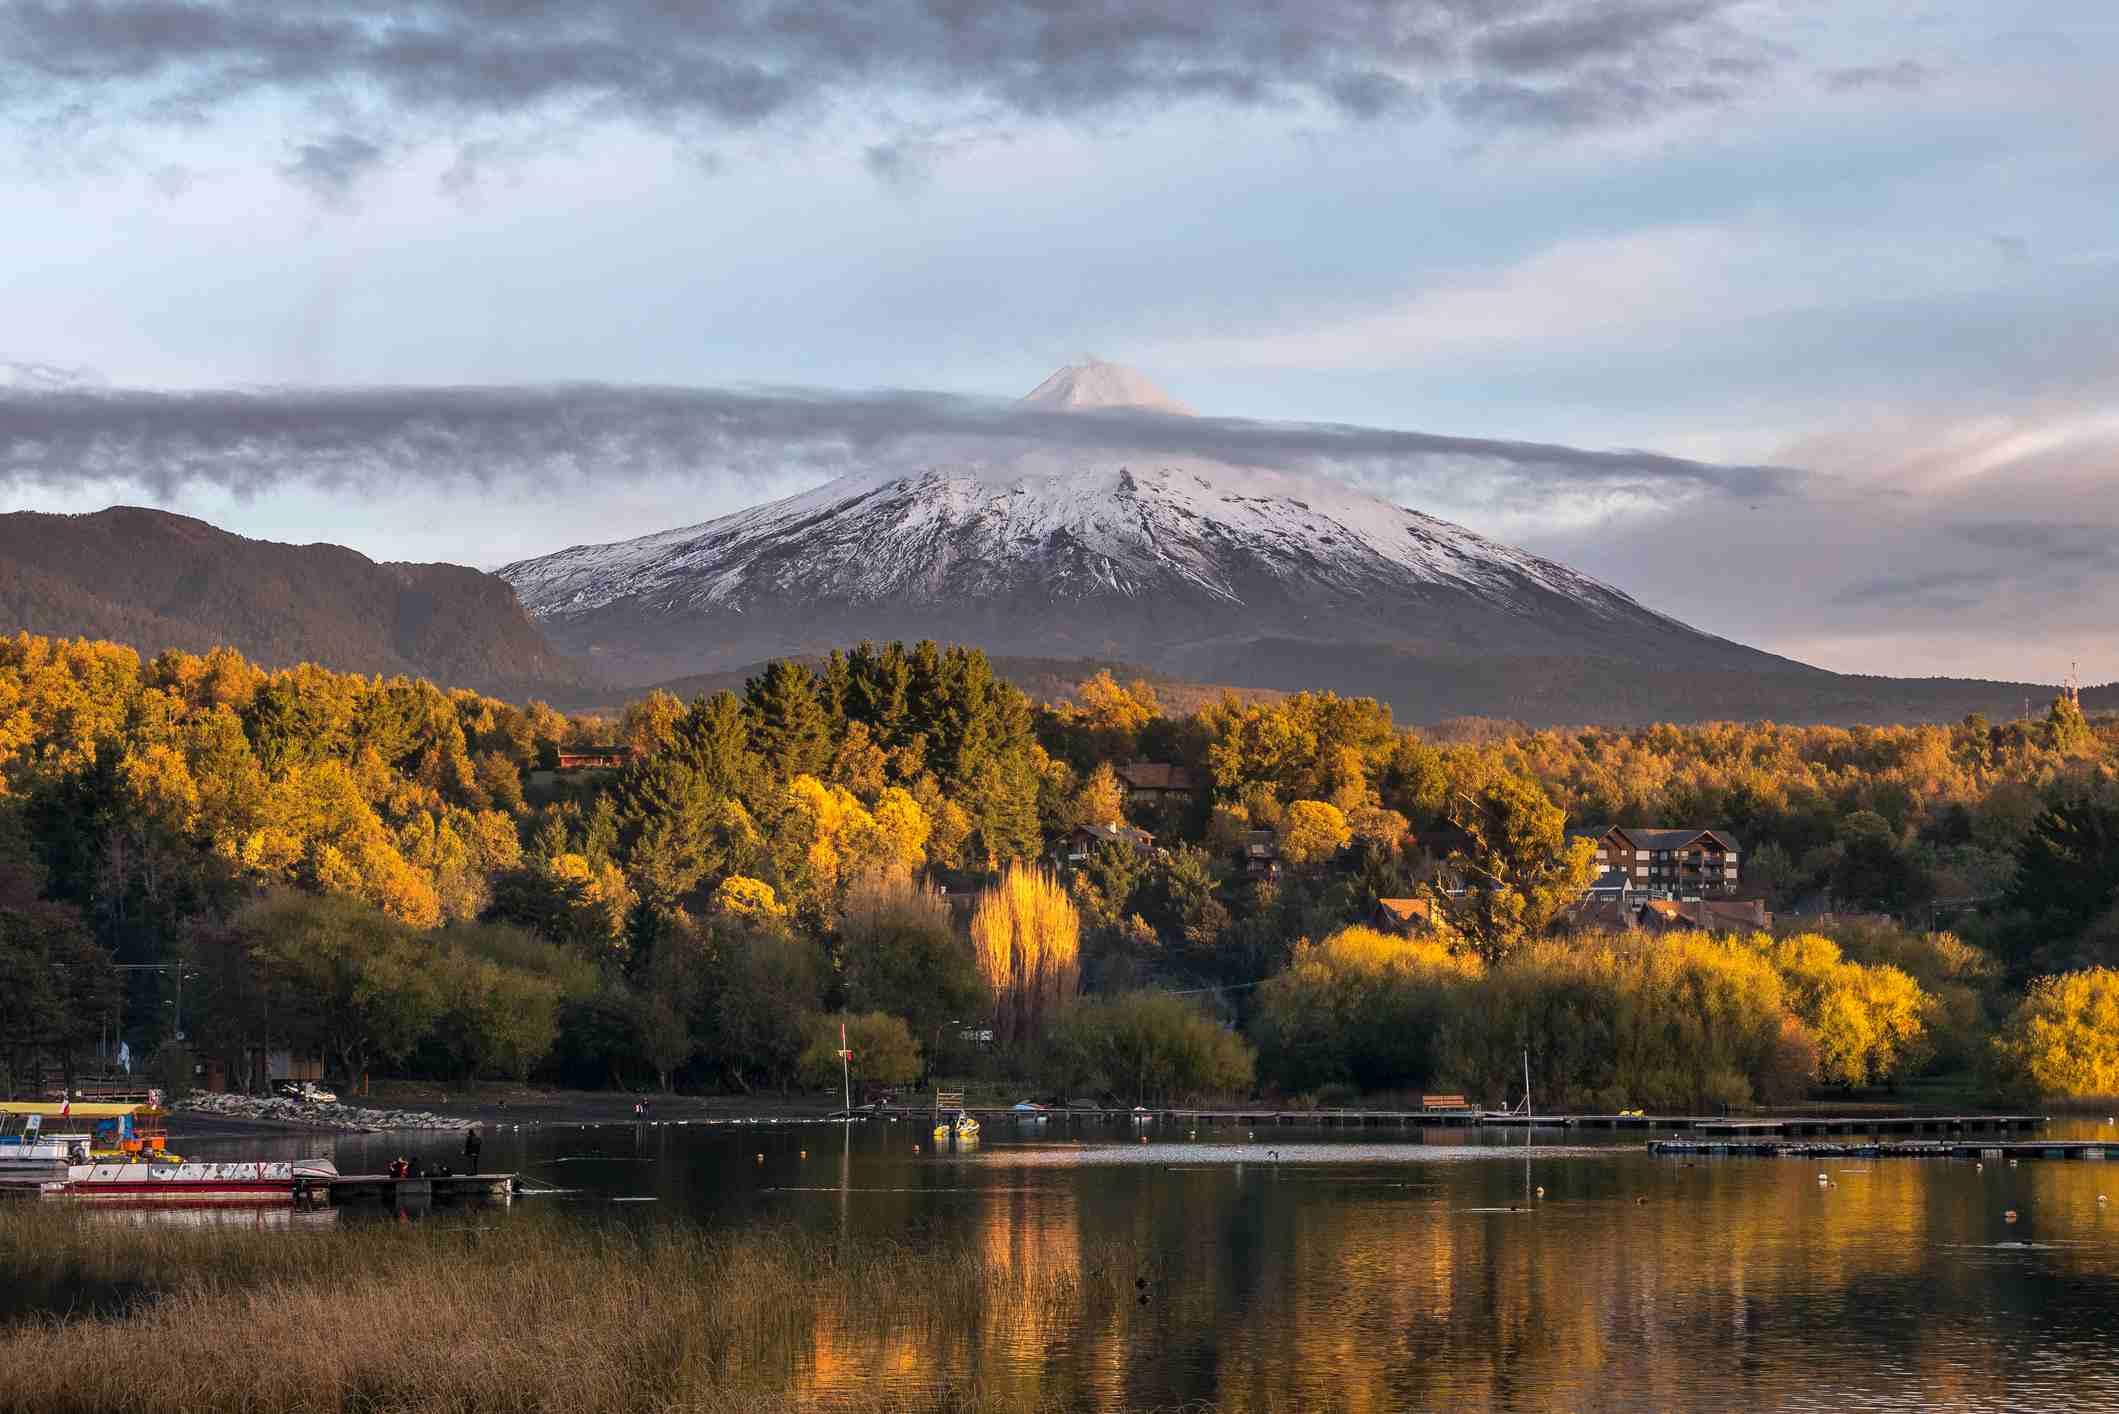 Villarrica Volcano at Sunset, Chile